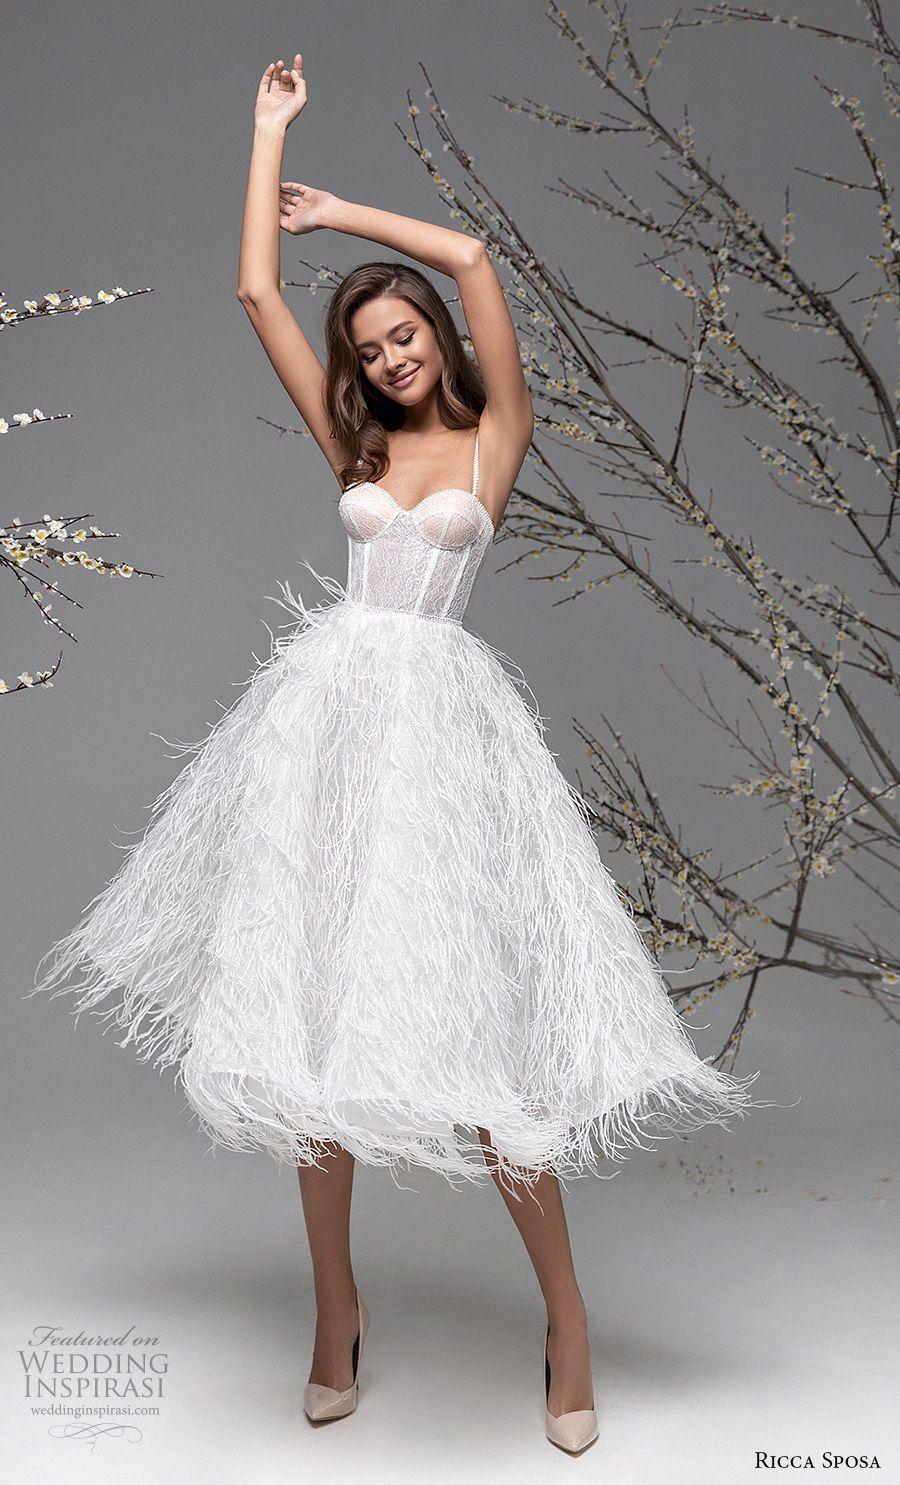 Ricca Sposa Spring 2020 2021 Wedding Dresses Blooming Spring Bridal Collection Wedding Inspirasi Short Wedding Dress Wedding Dress Styles Dresses [ 1485 x 900 Pixel ]